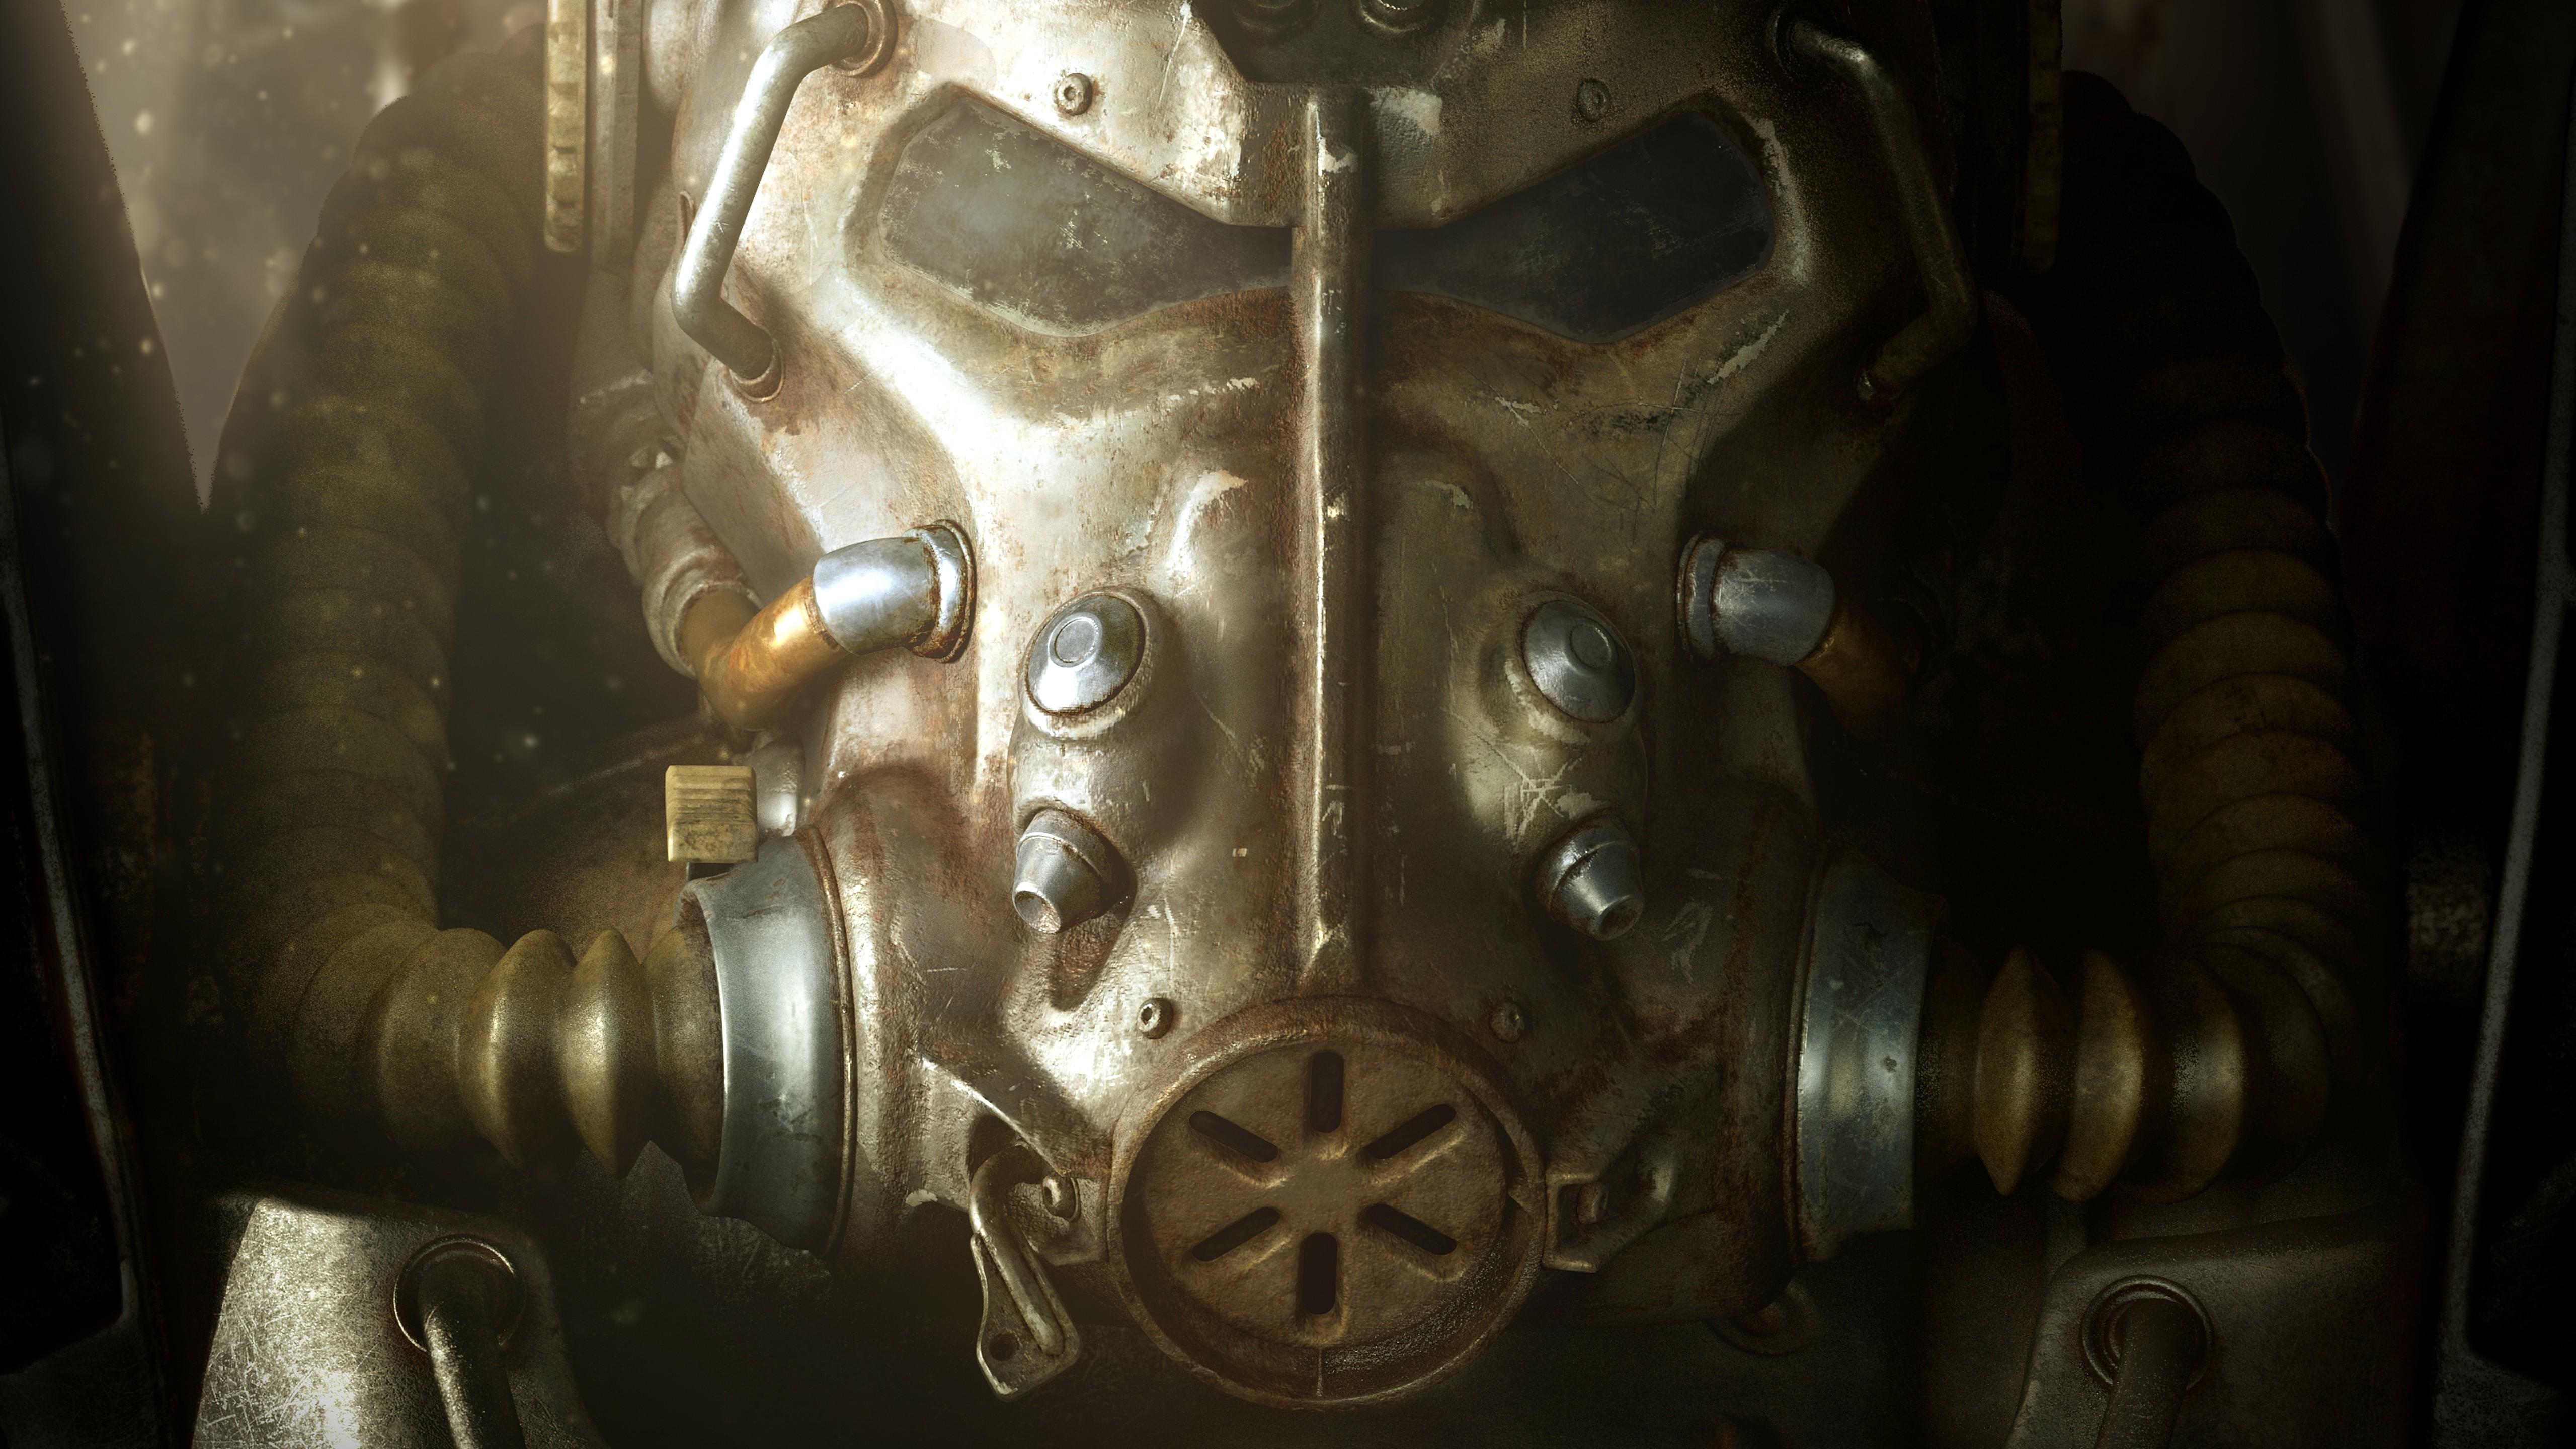 Fallout 4 By Darkestcrusader On Deviantart